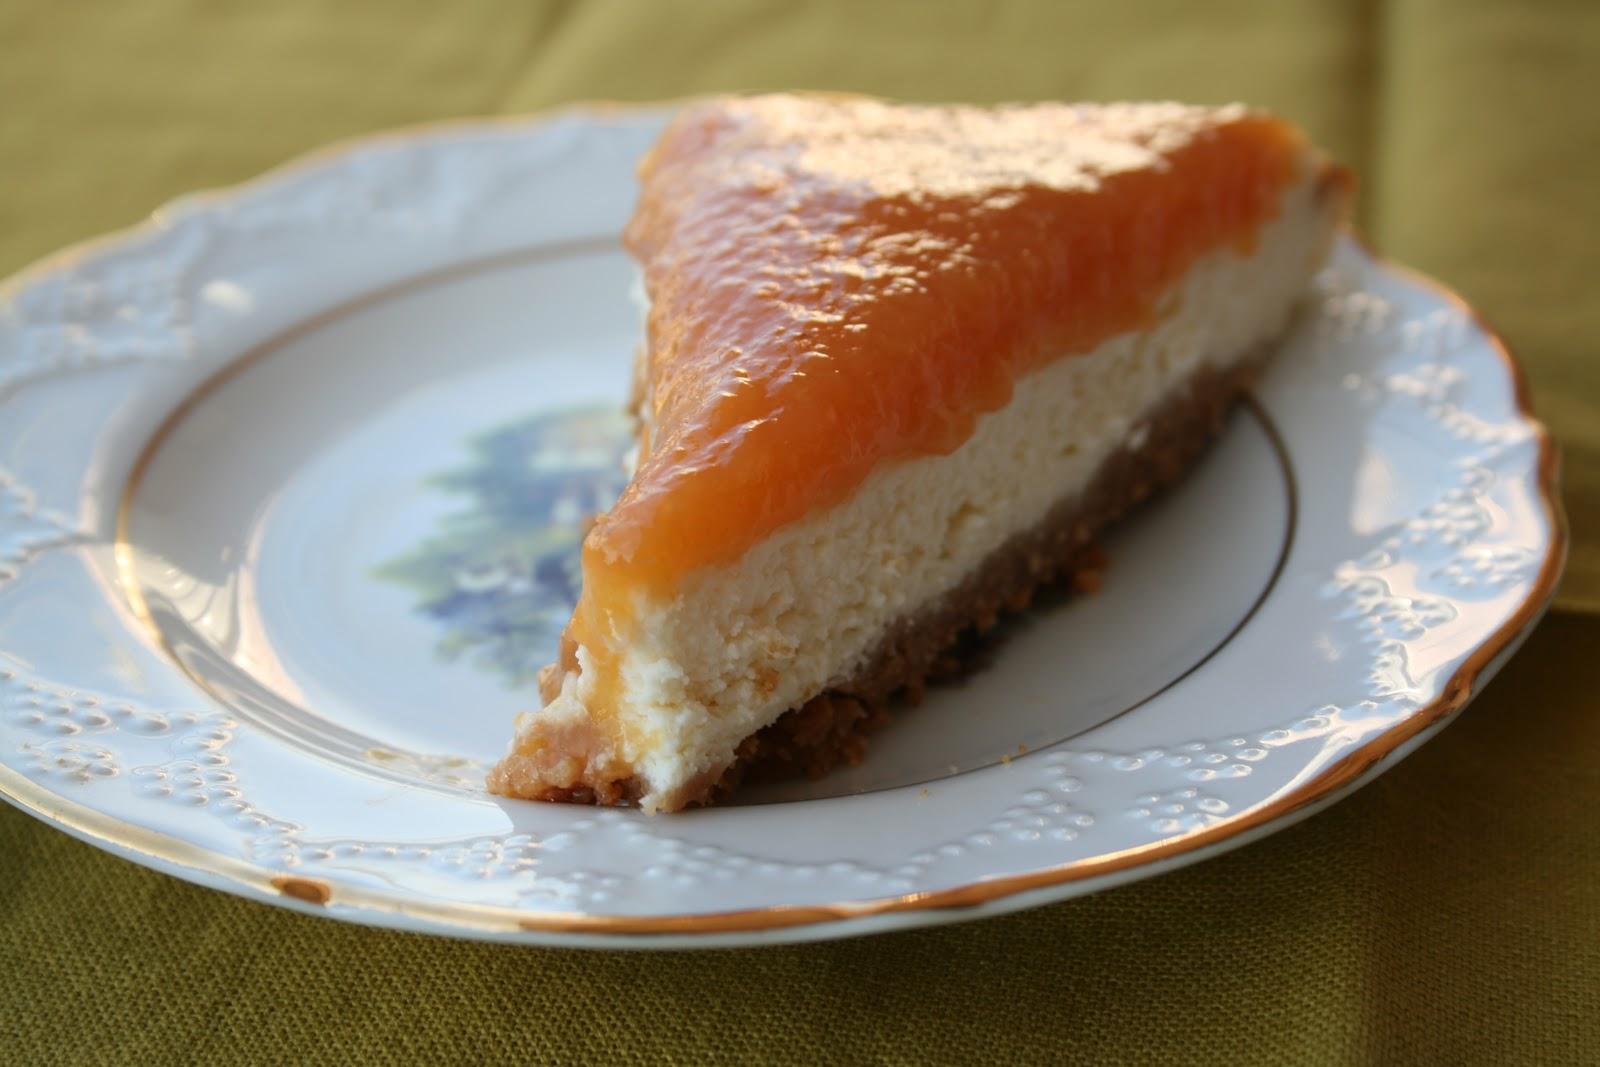 Şeftalili çiz kek tarifi